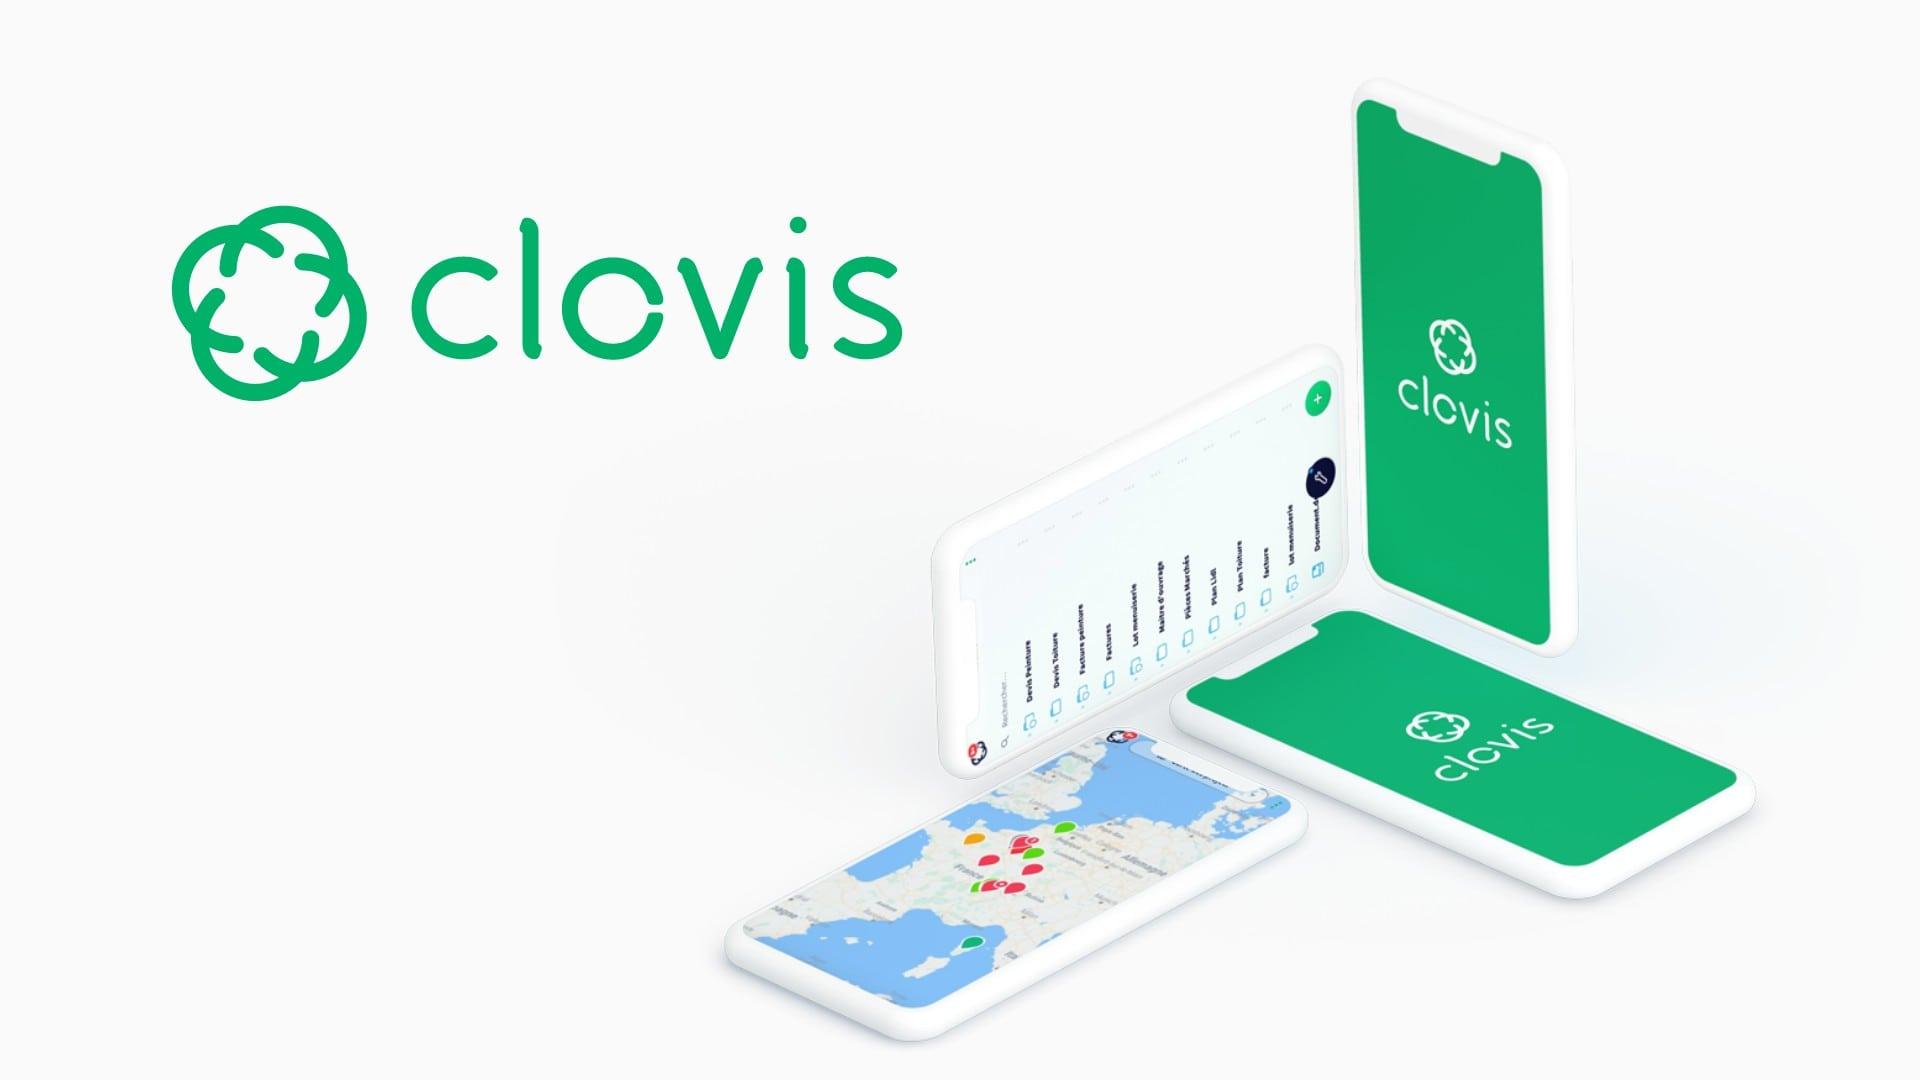 Clovis application